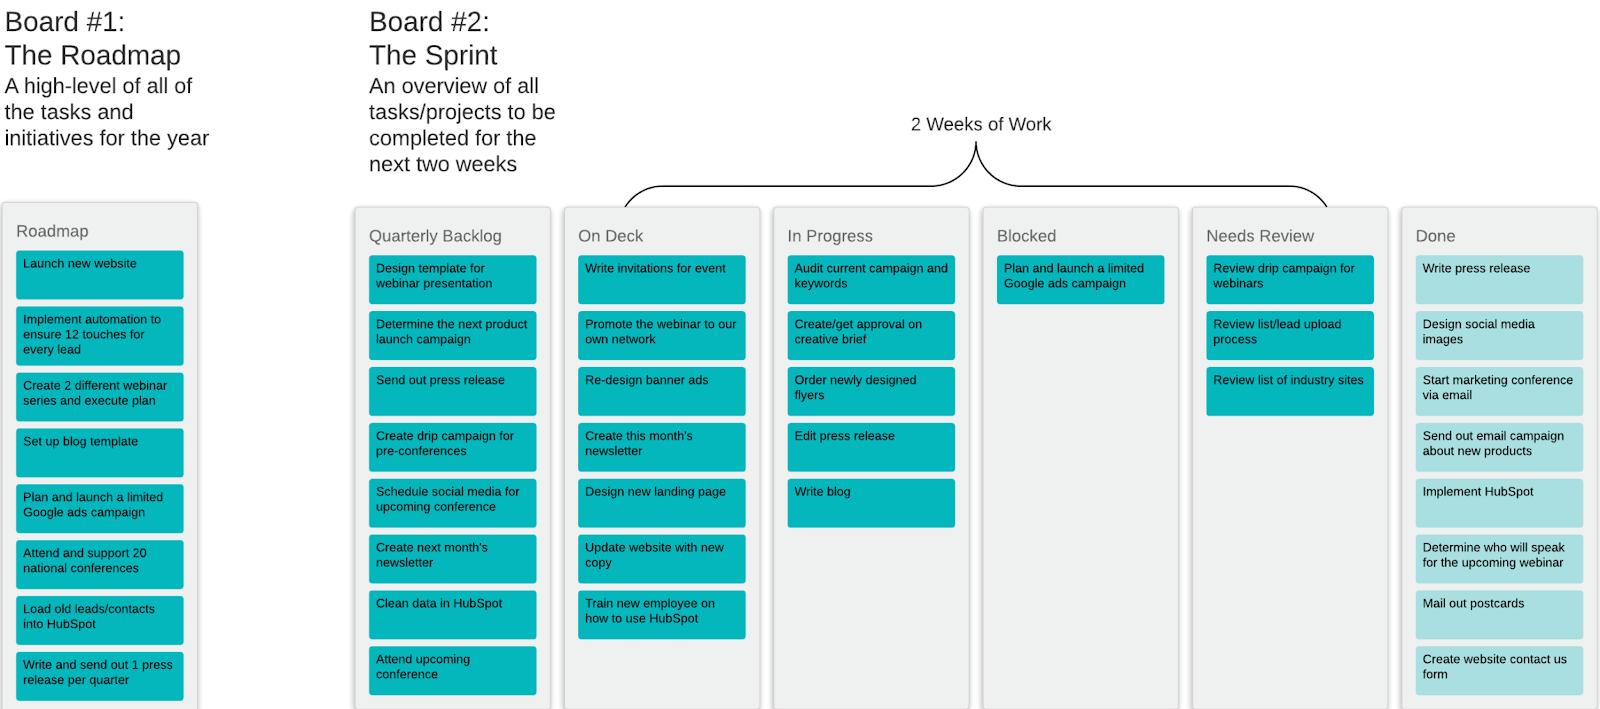 Agile Marketing Roadmap and Sprint Board